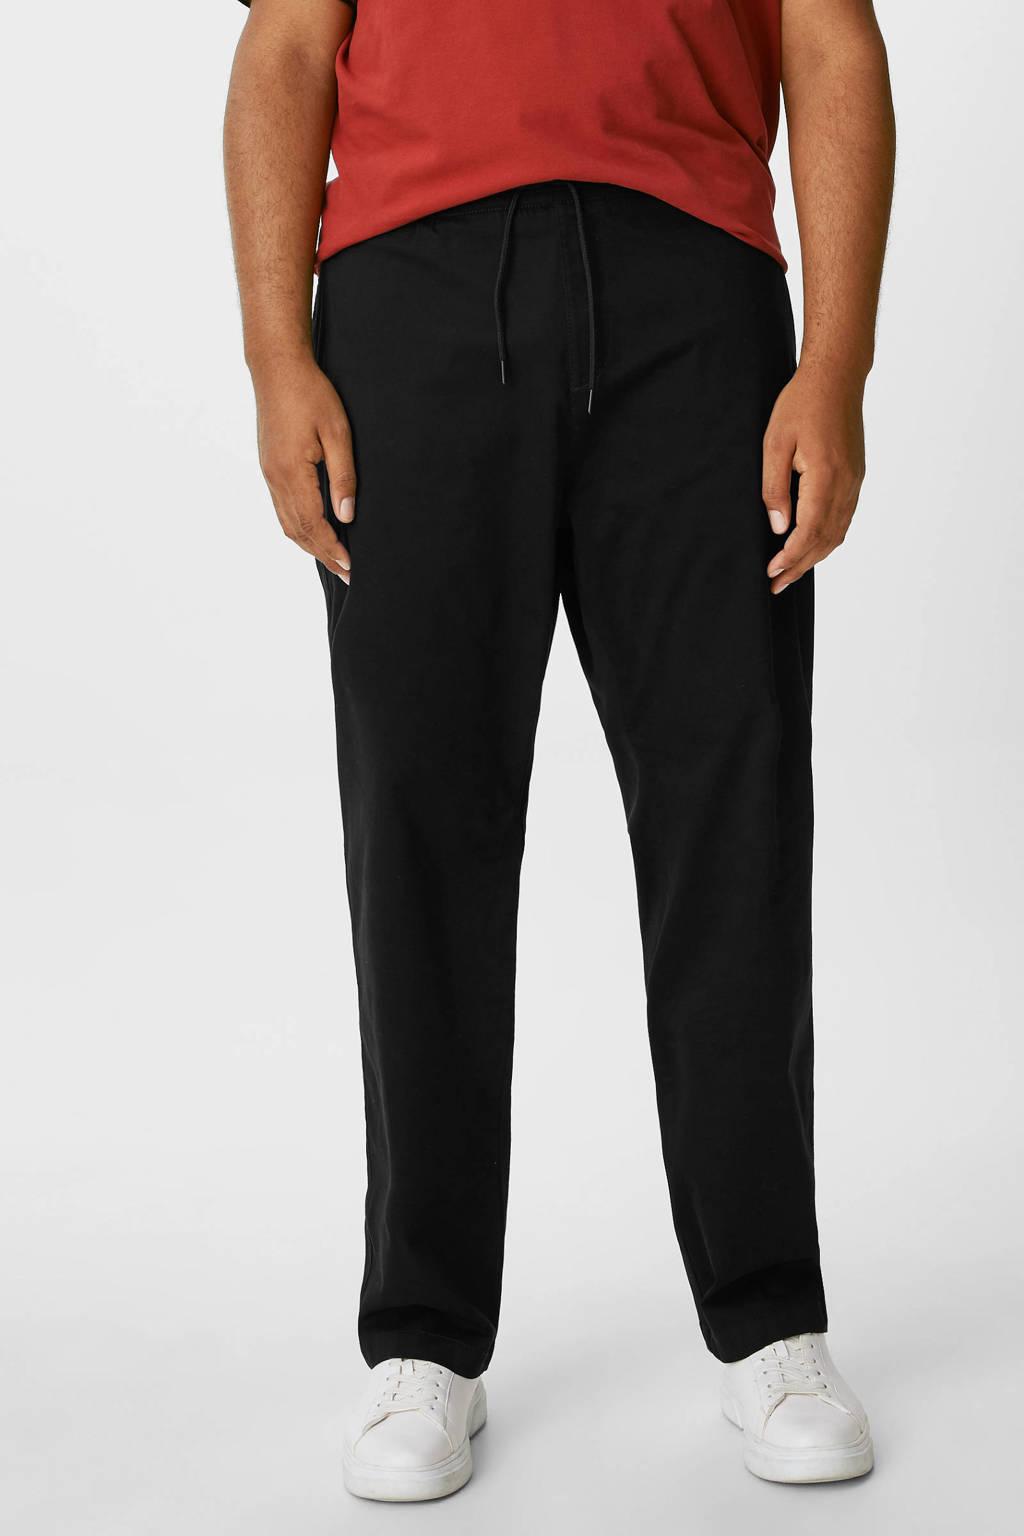 C&A XL regular fit broek donkerblauw, Donkerblauw